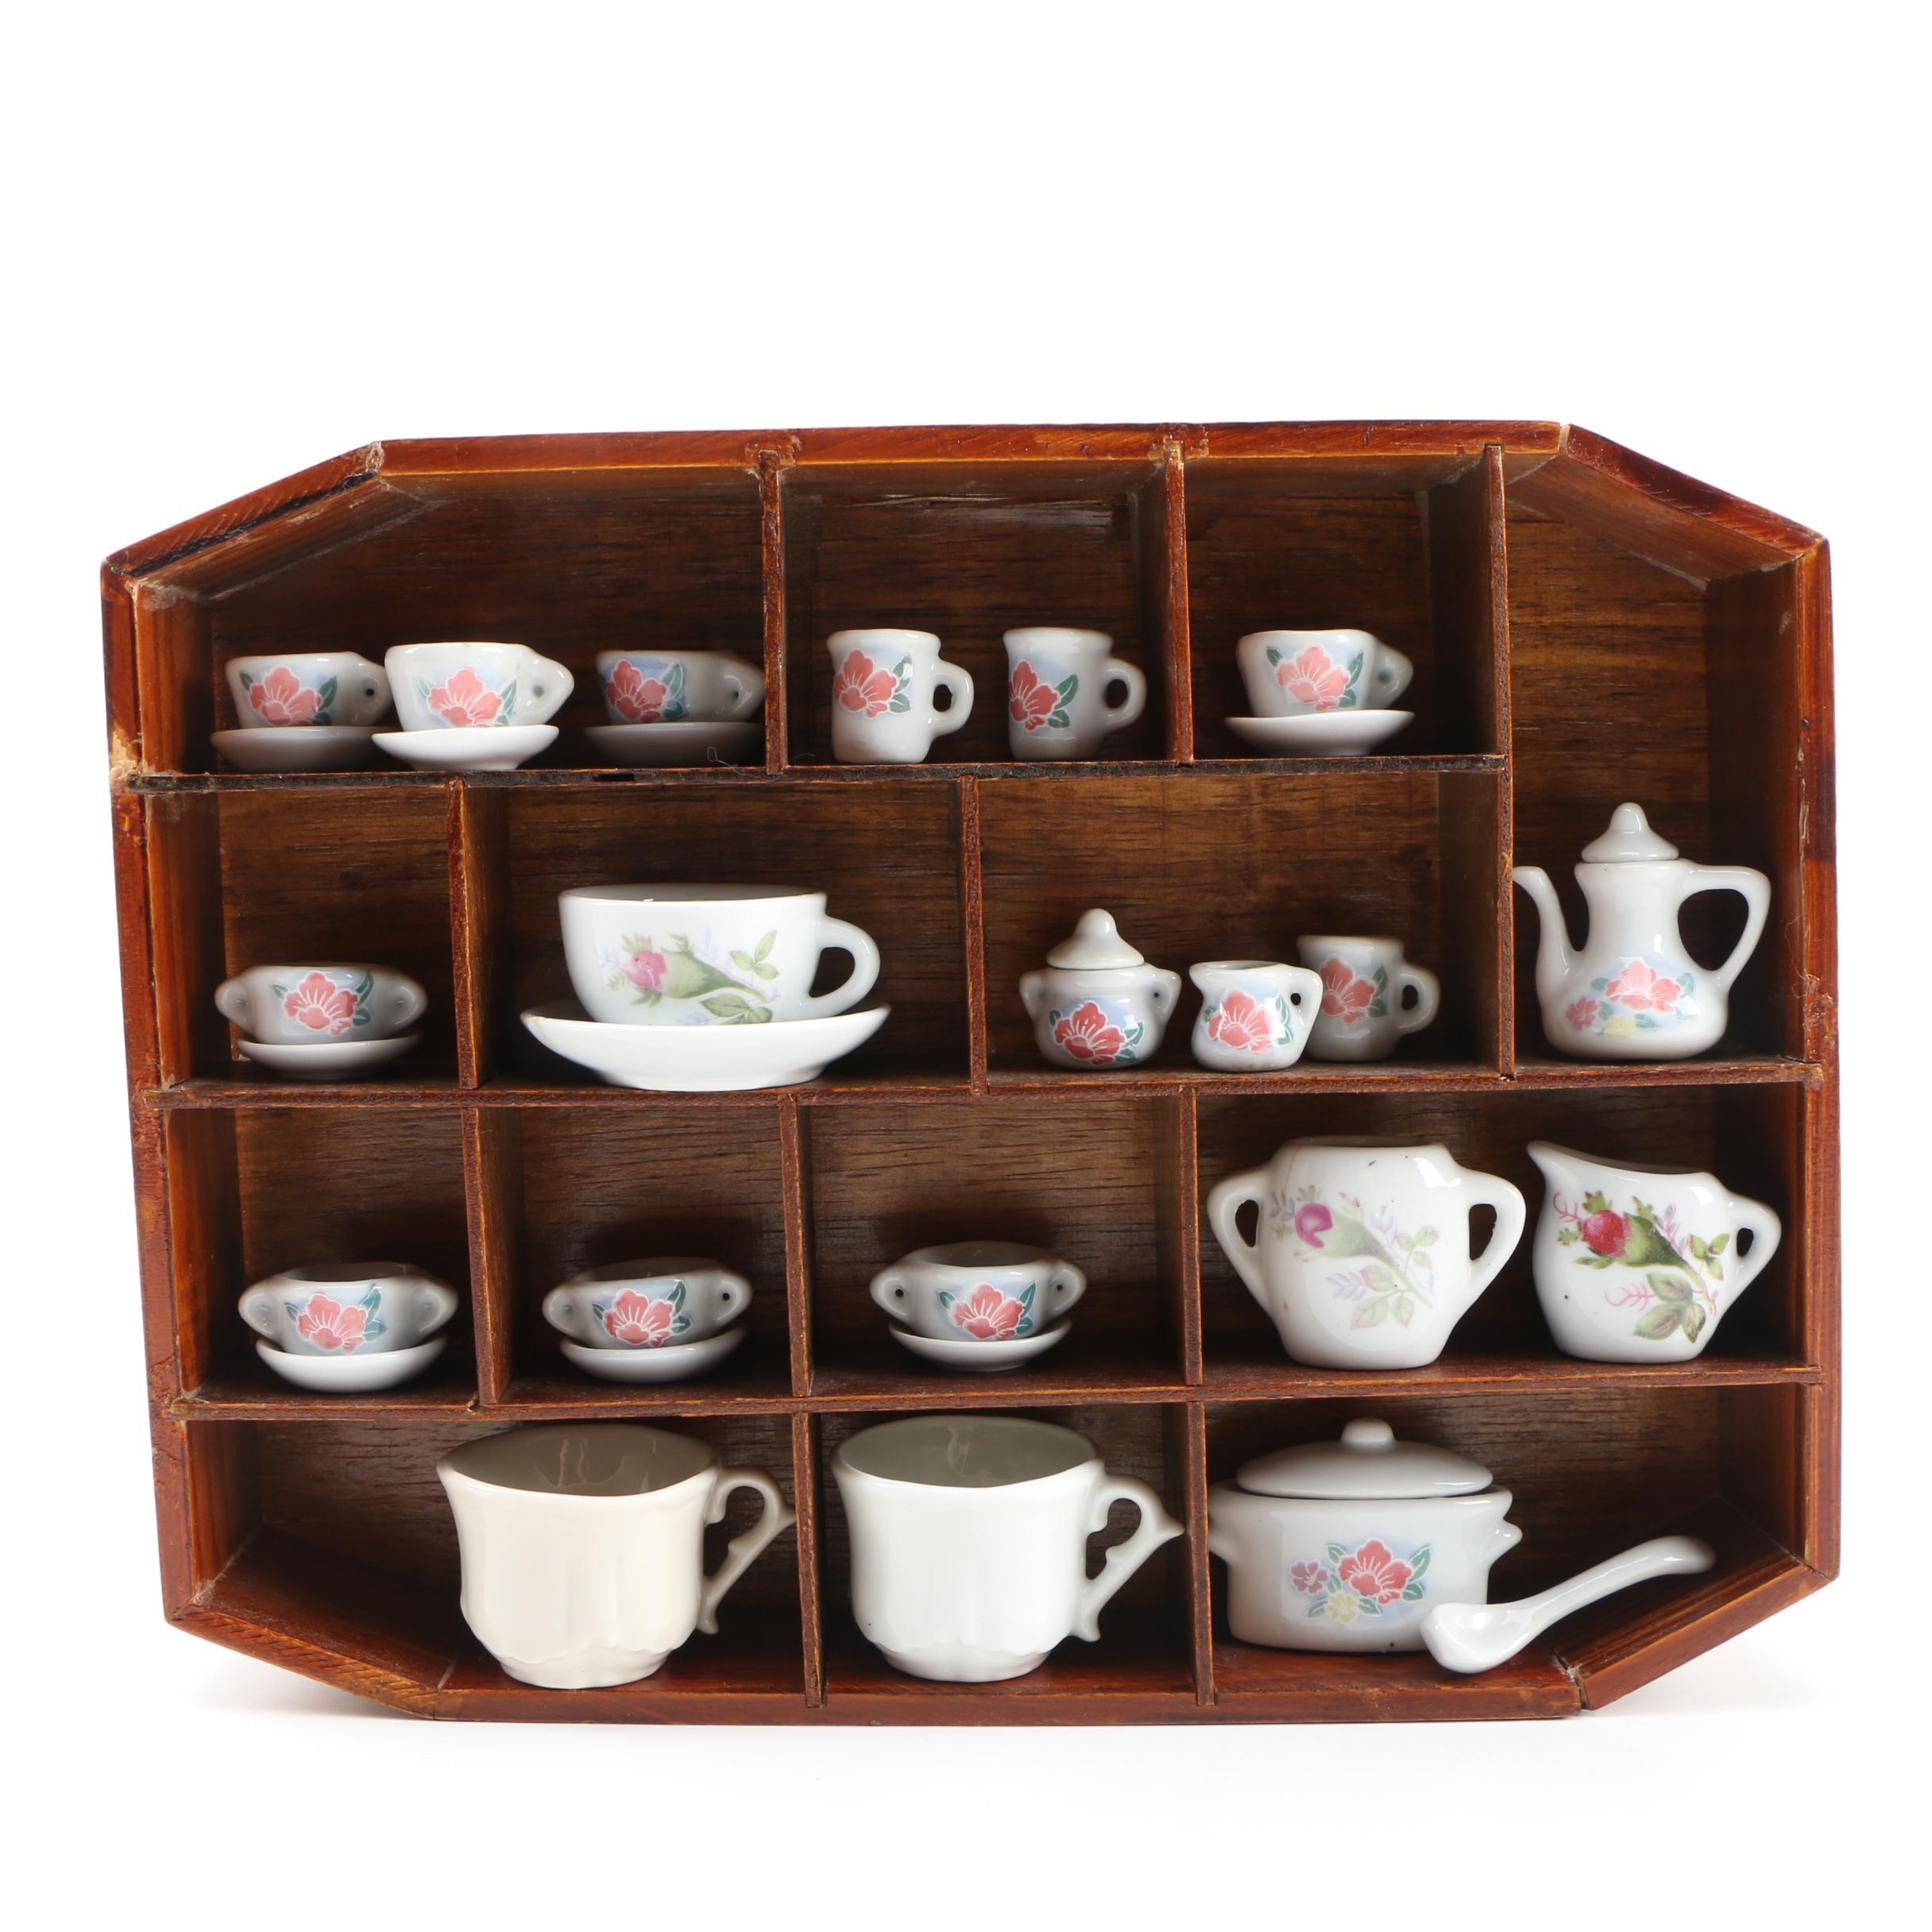 Miniature Ceramic Tea Set with Display Case